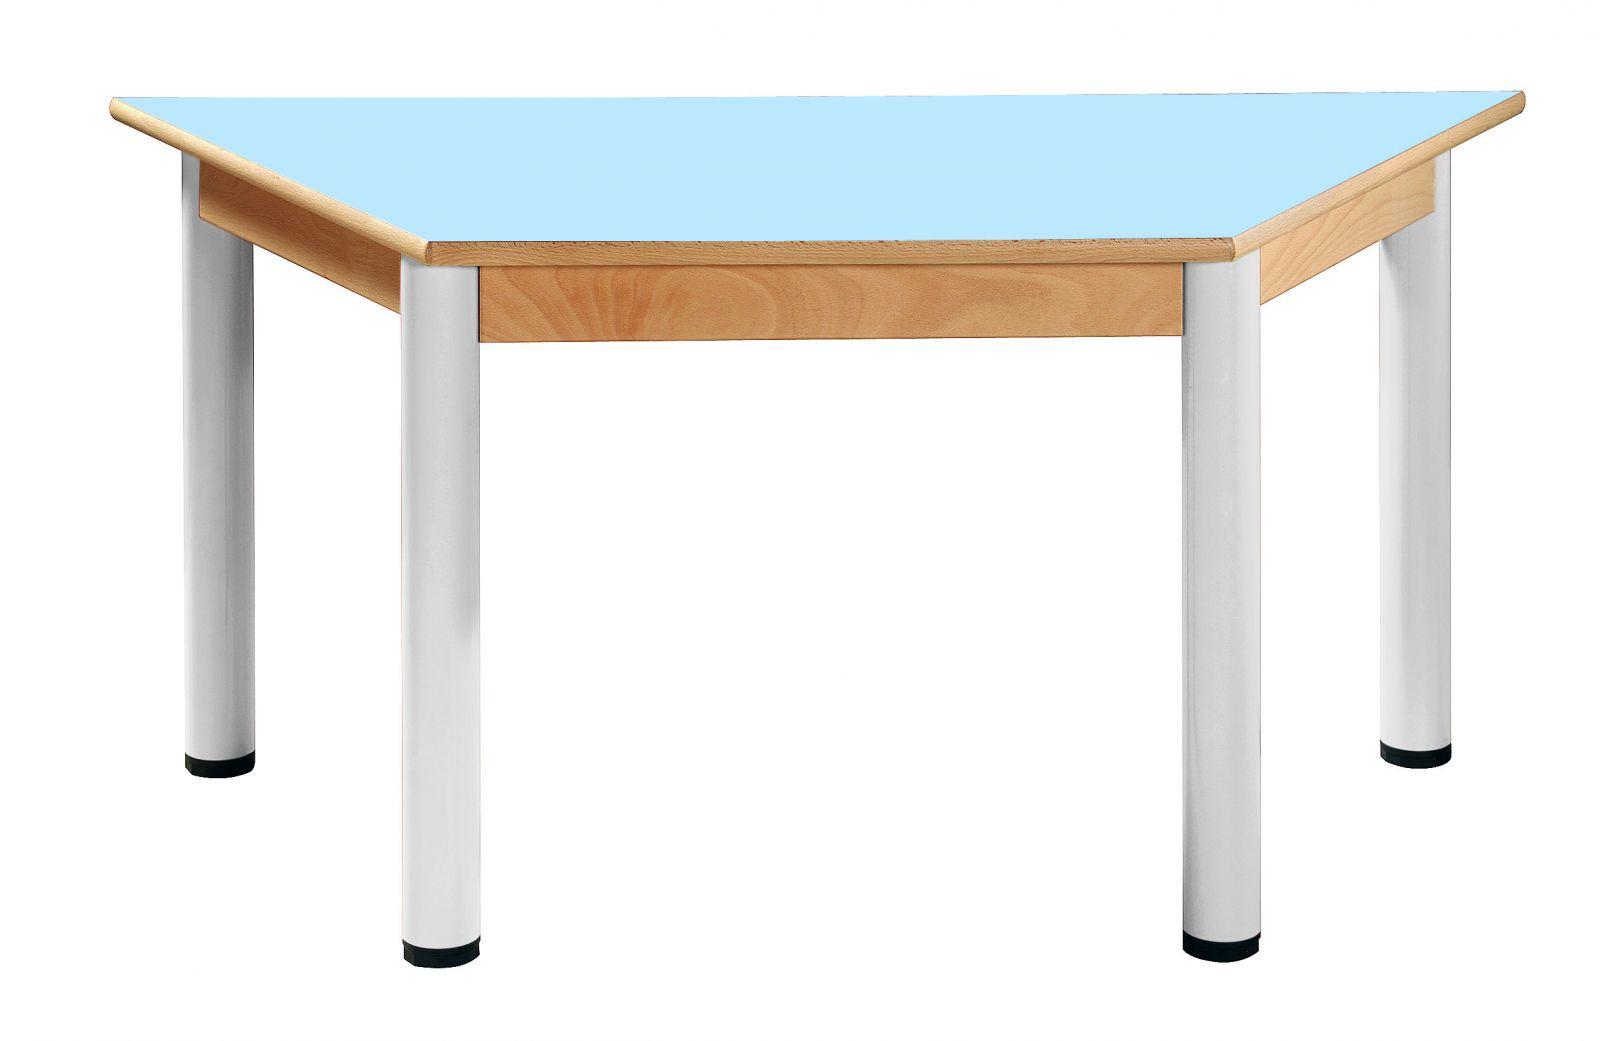 Stôl umakart trapézový 120 x 60 cm / výška 40 - 58 cm